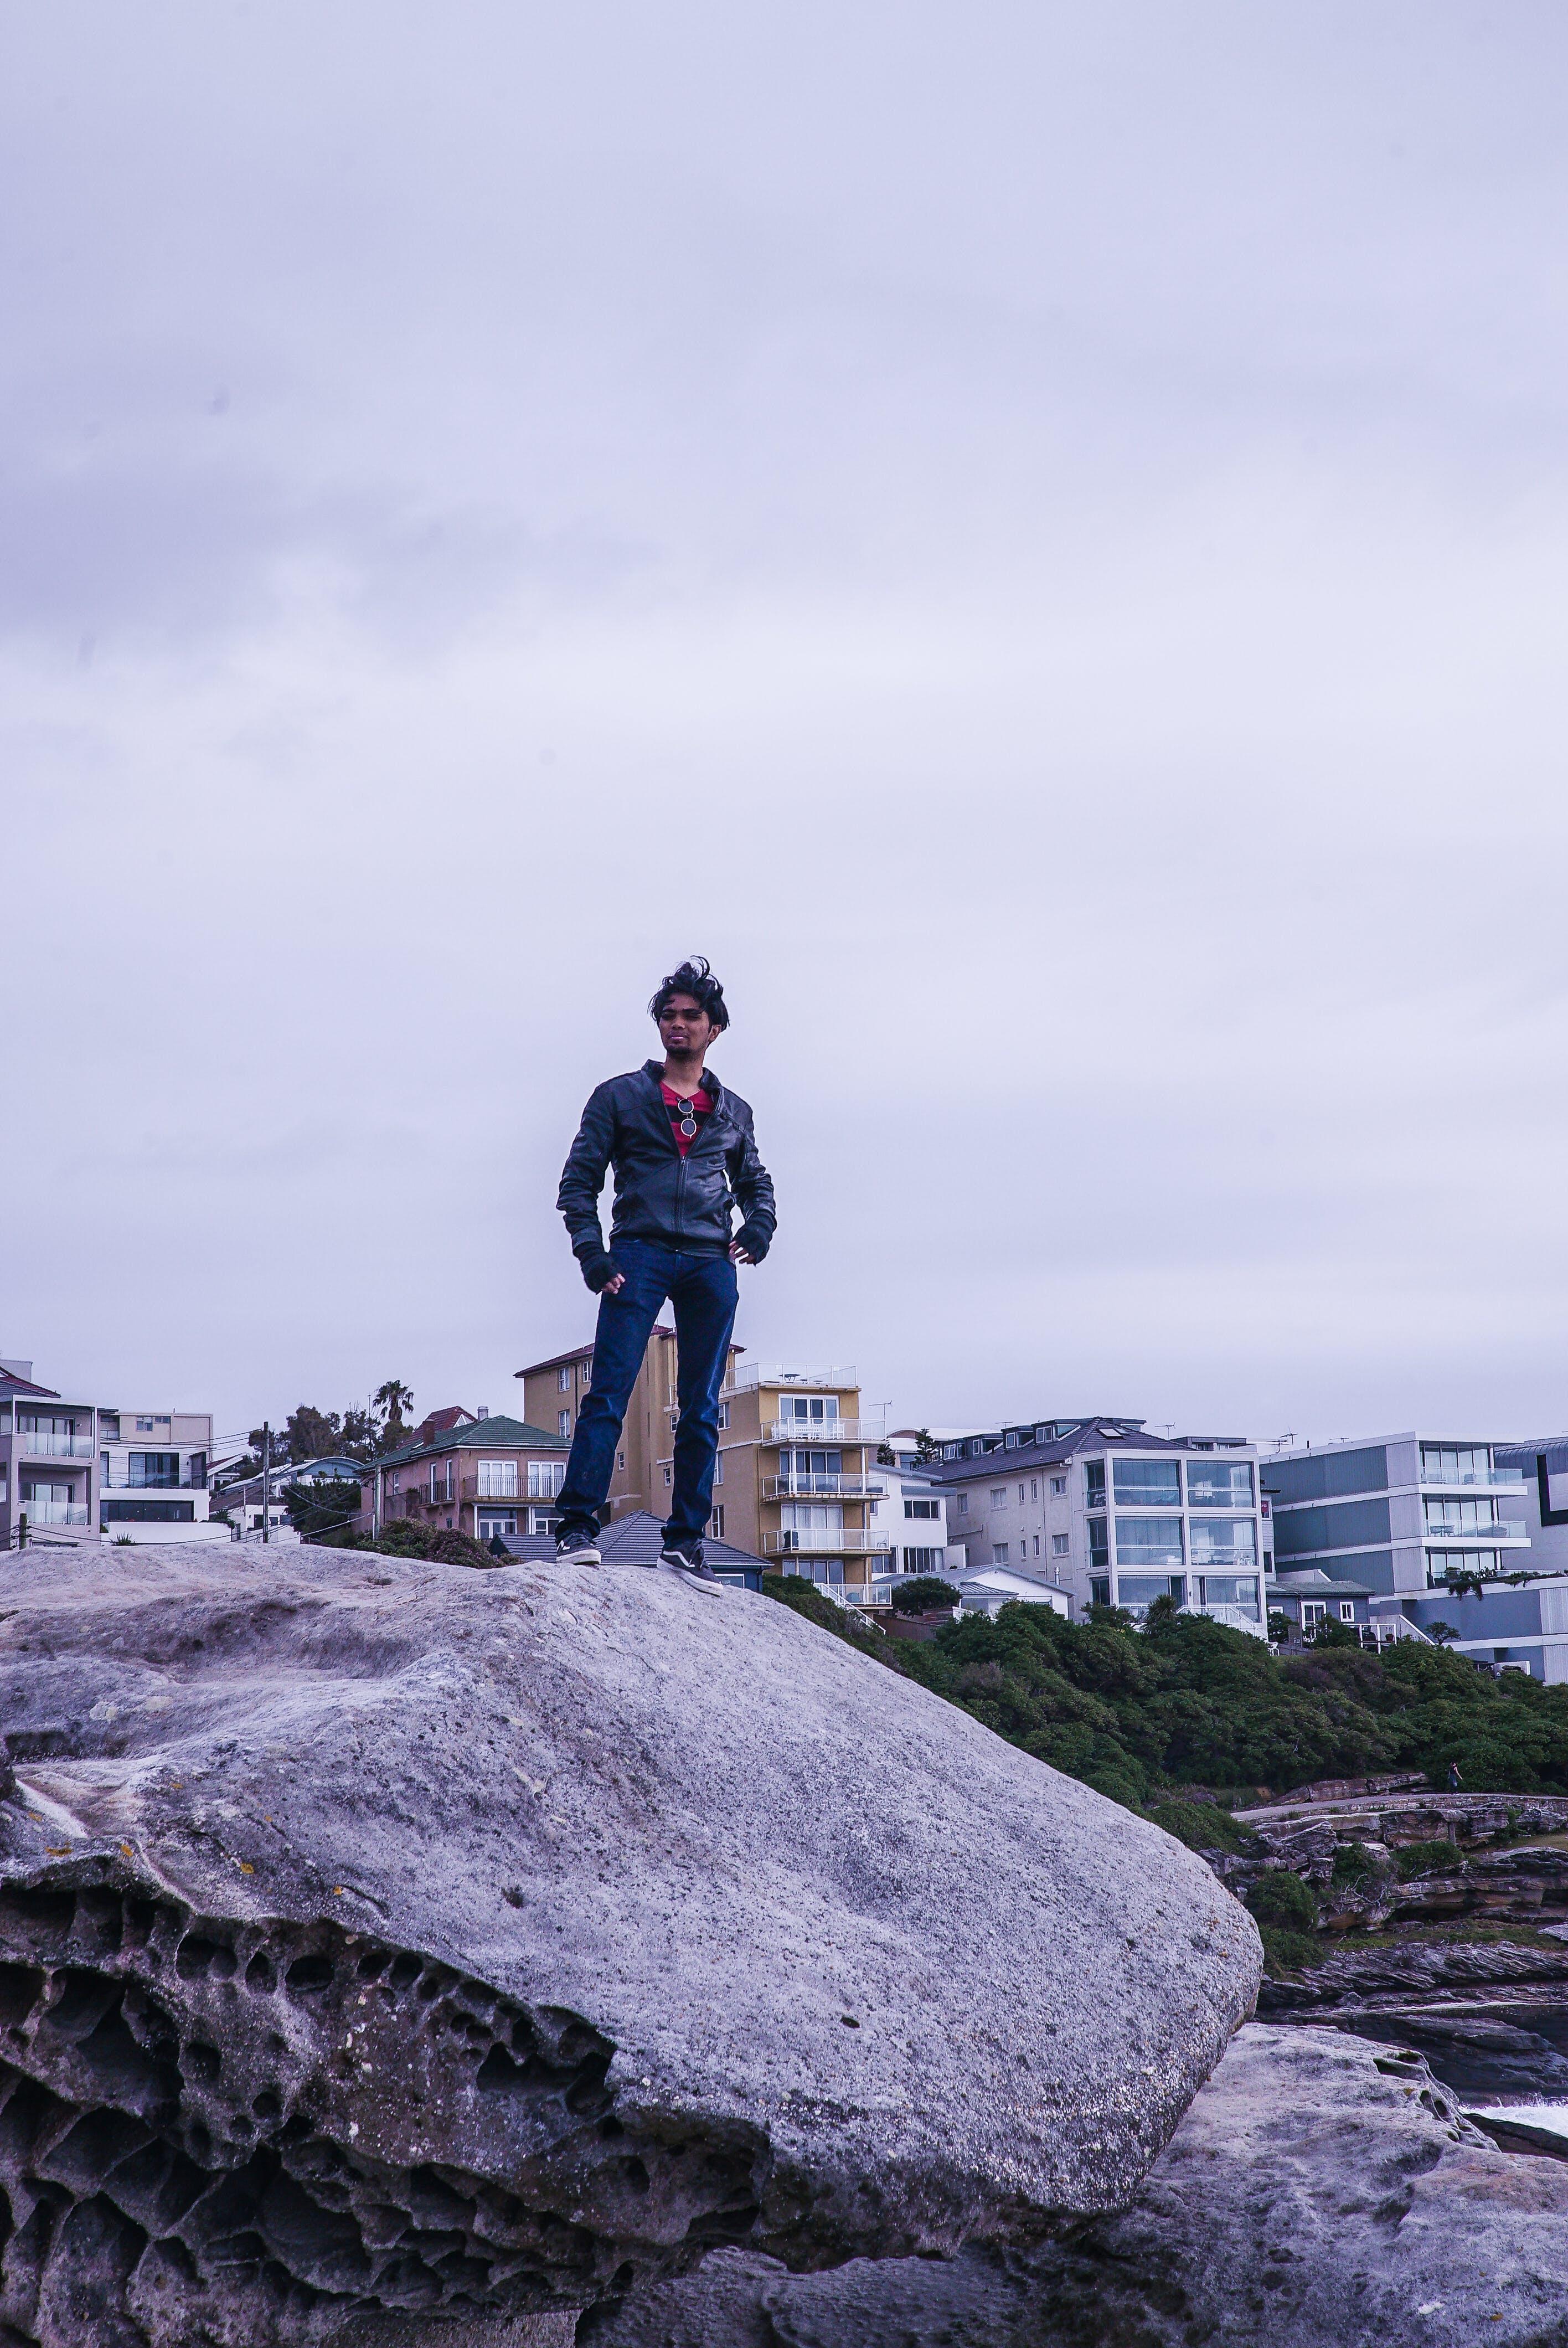 Man Standing on Gray Rock